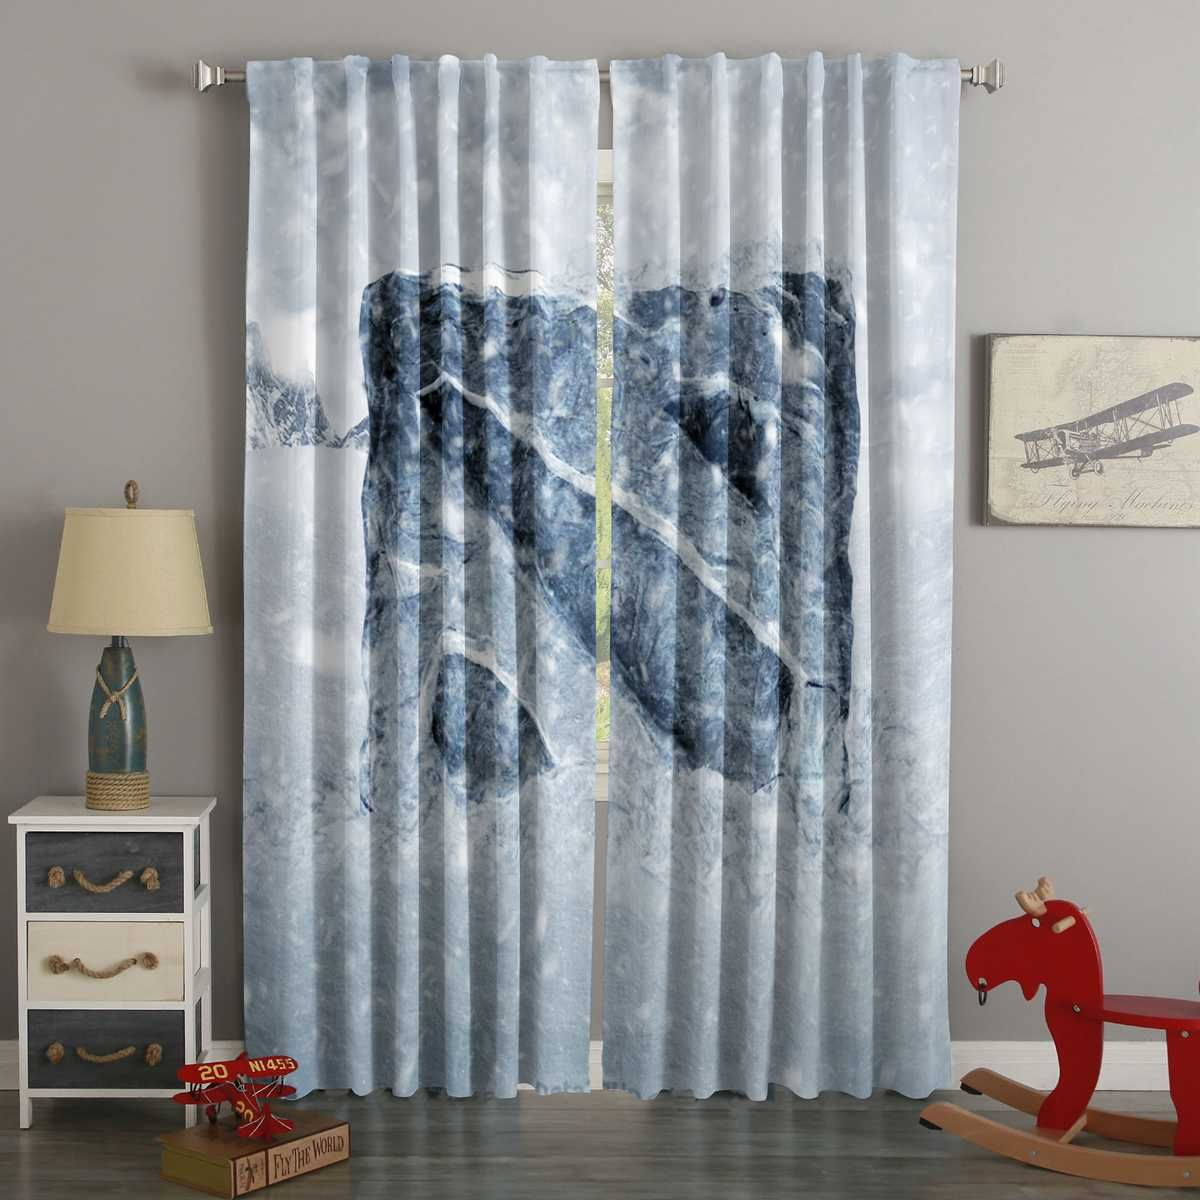 3d Printed Dota2 Style Custom Living Room Curtains Curtains Living Room Curtains Custom Curtains #printed #living #room #curtains